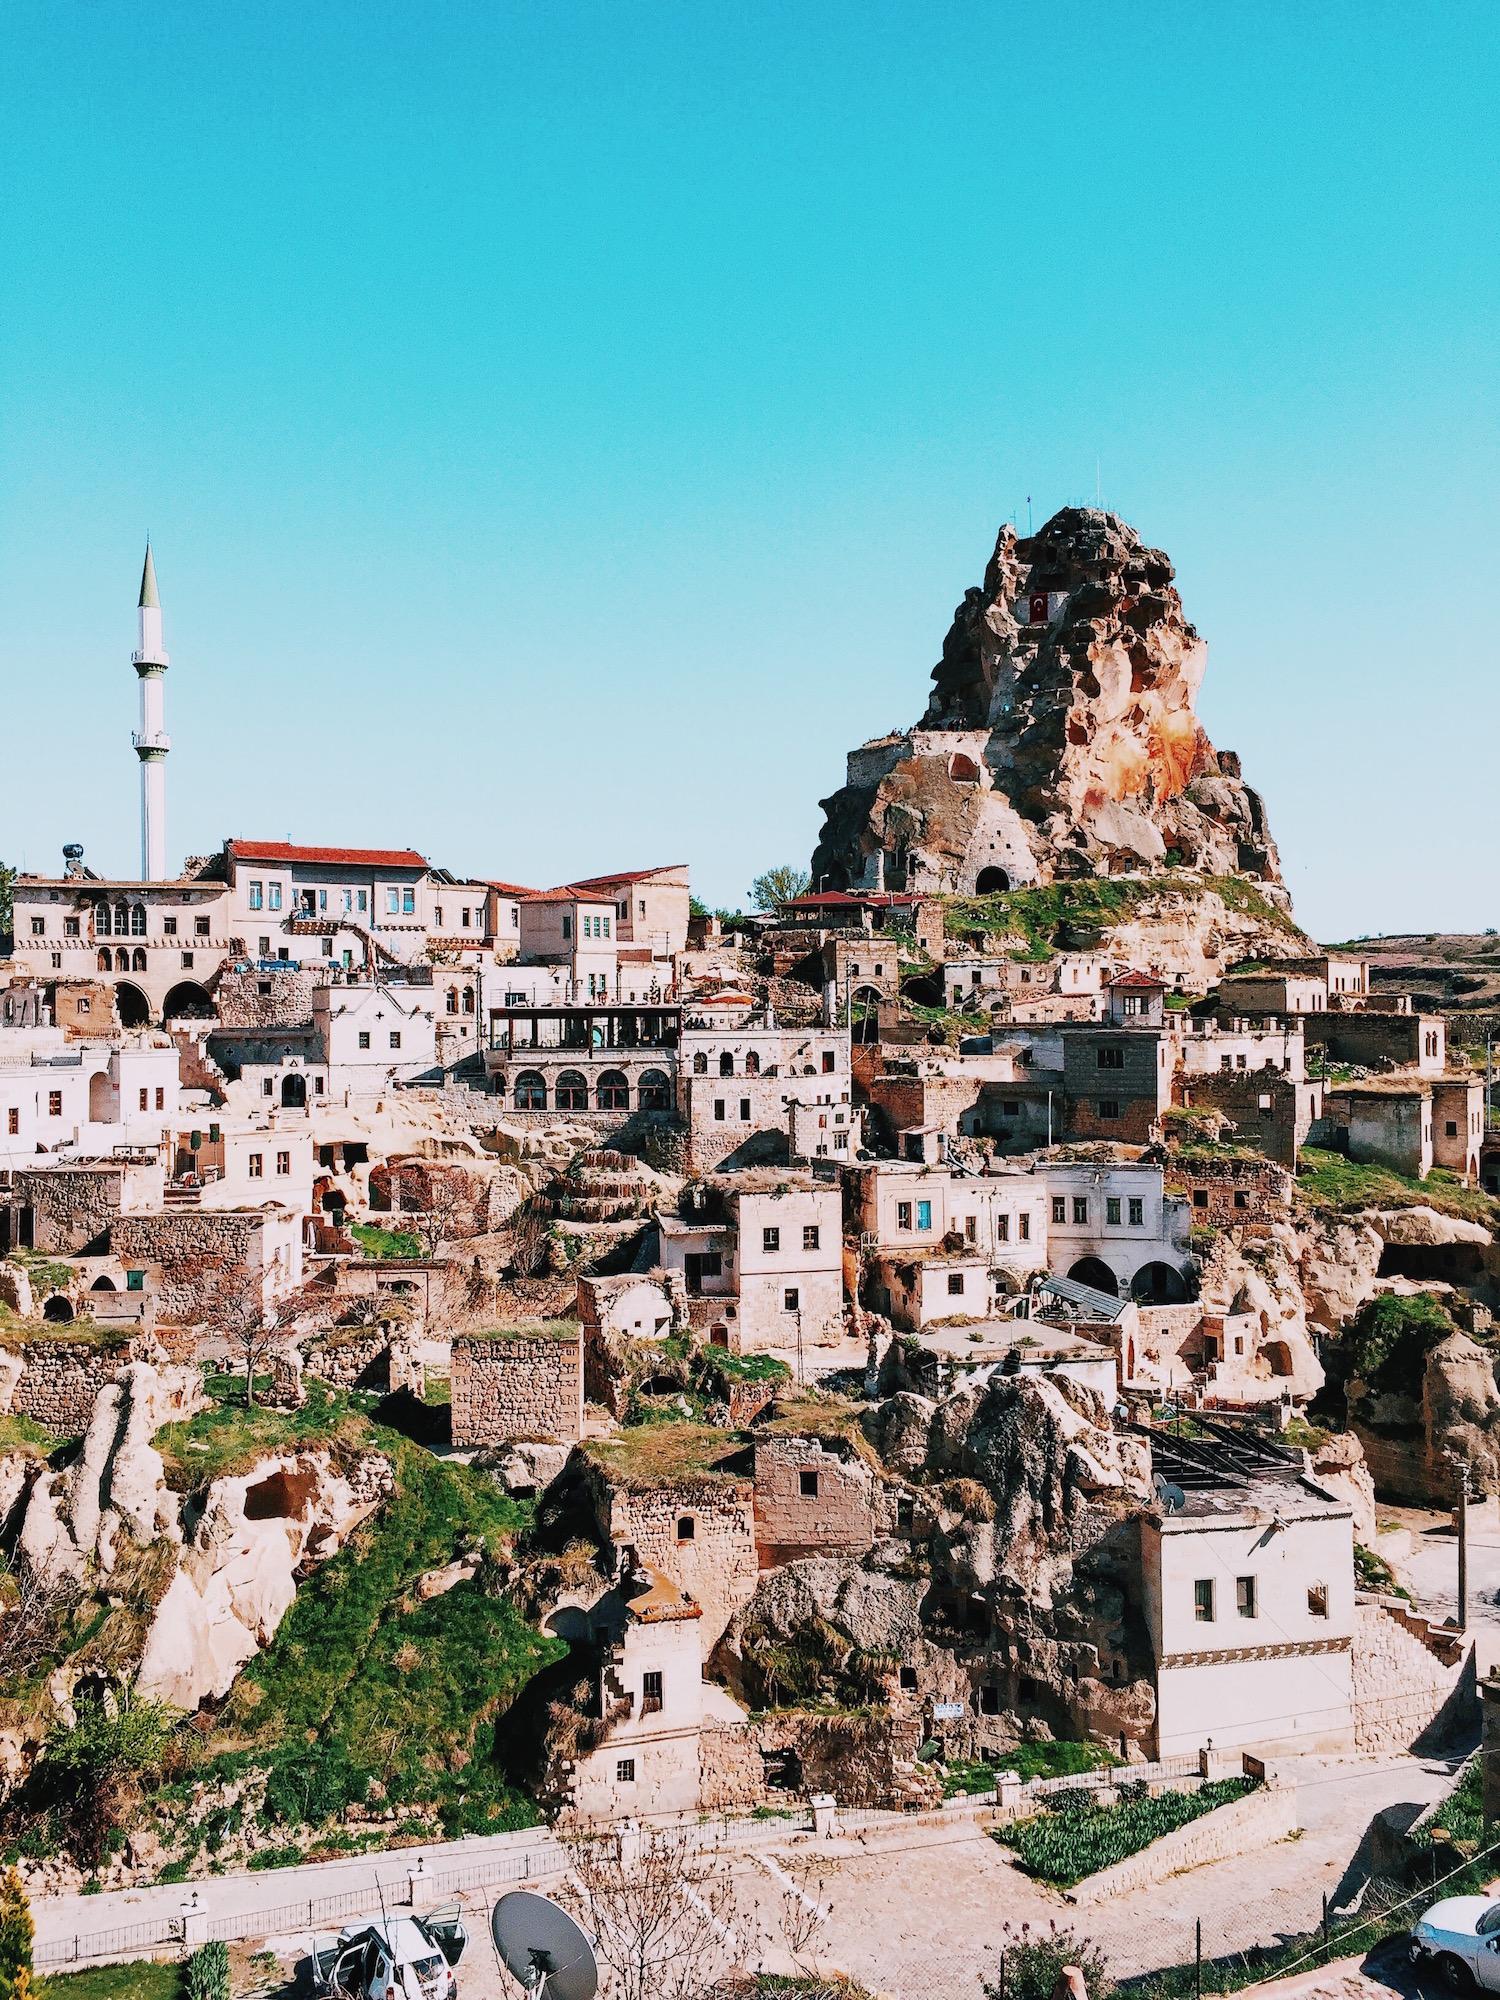 Best Photo Locations in Cappadocia Turkey